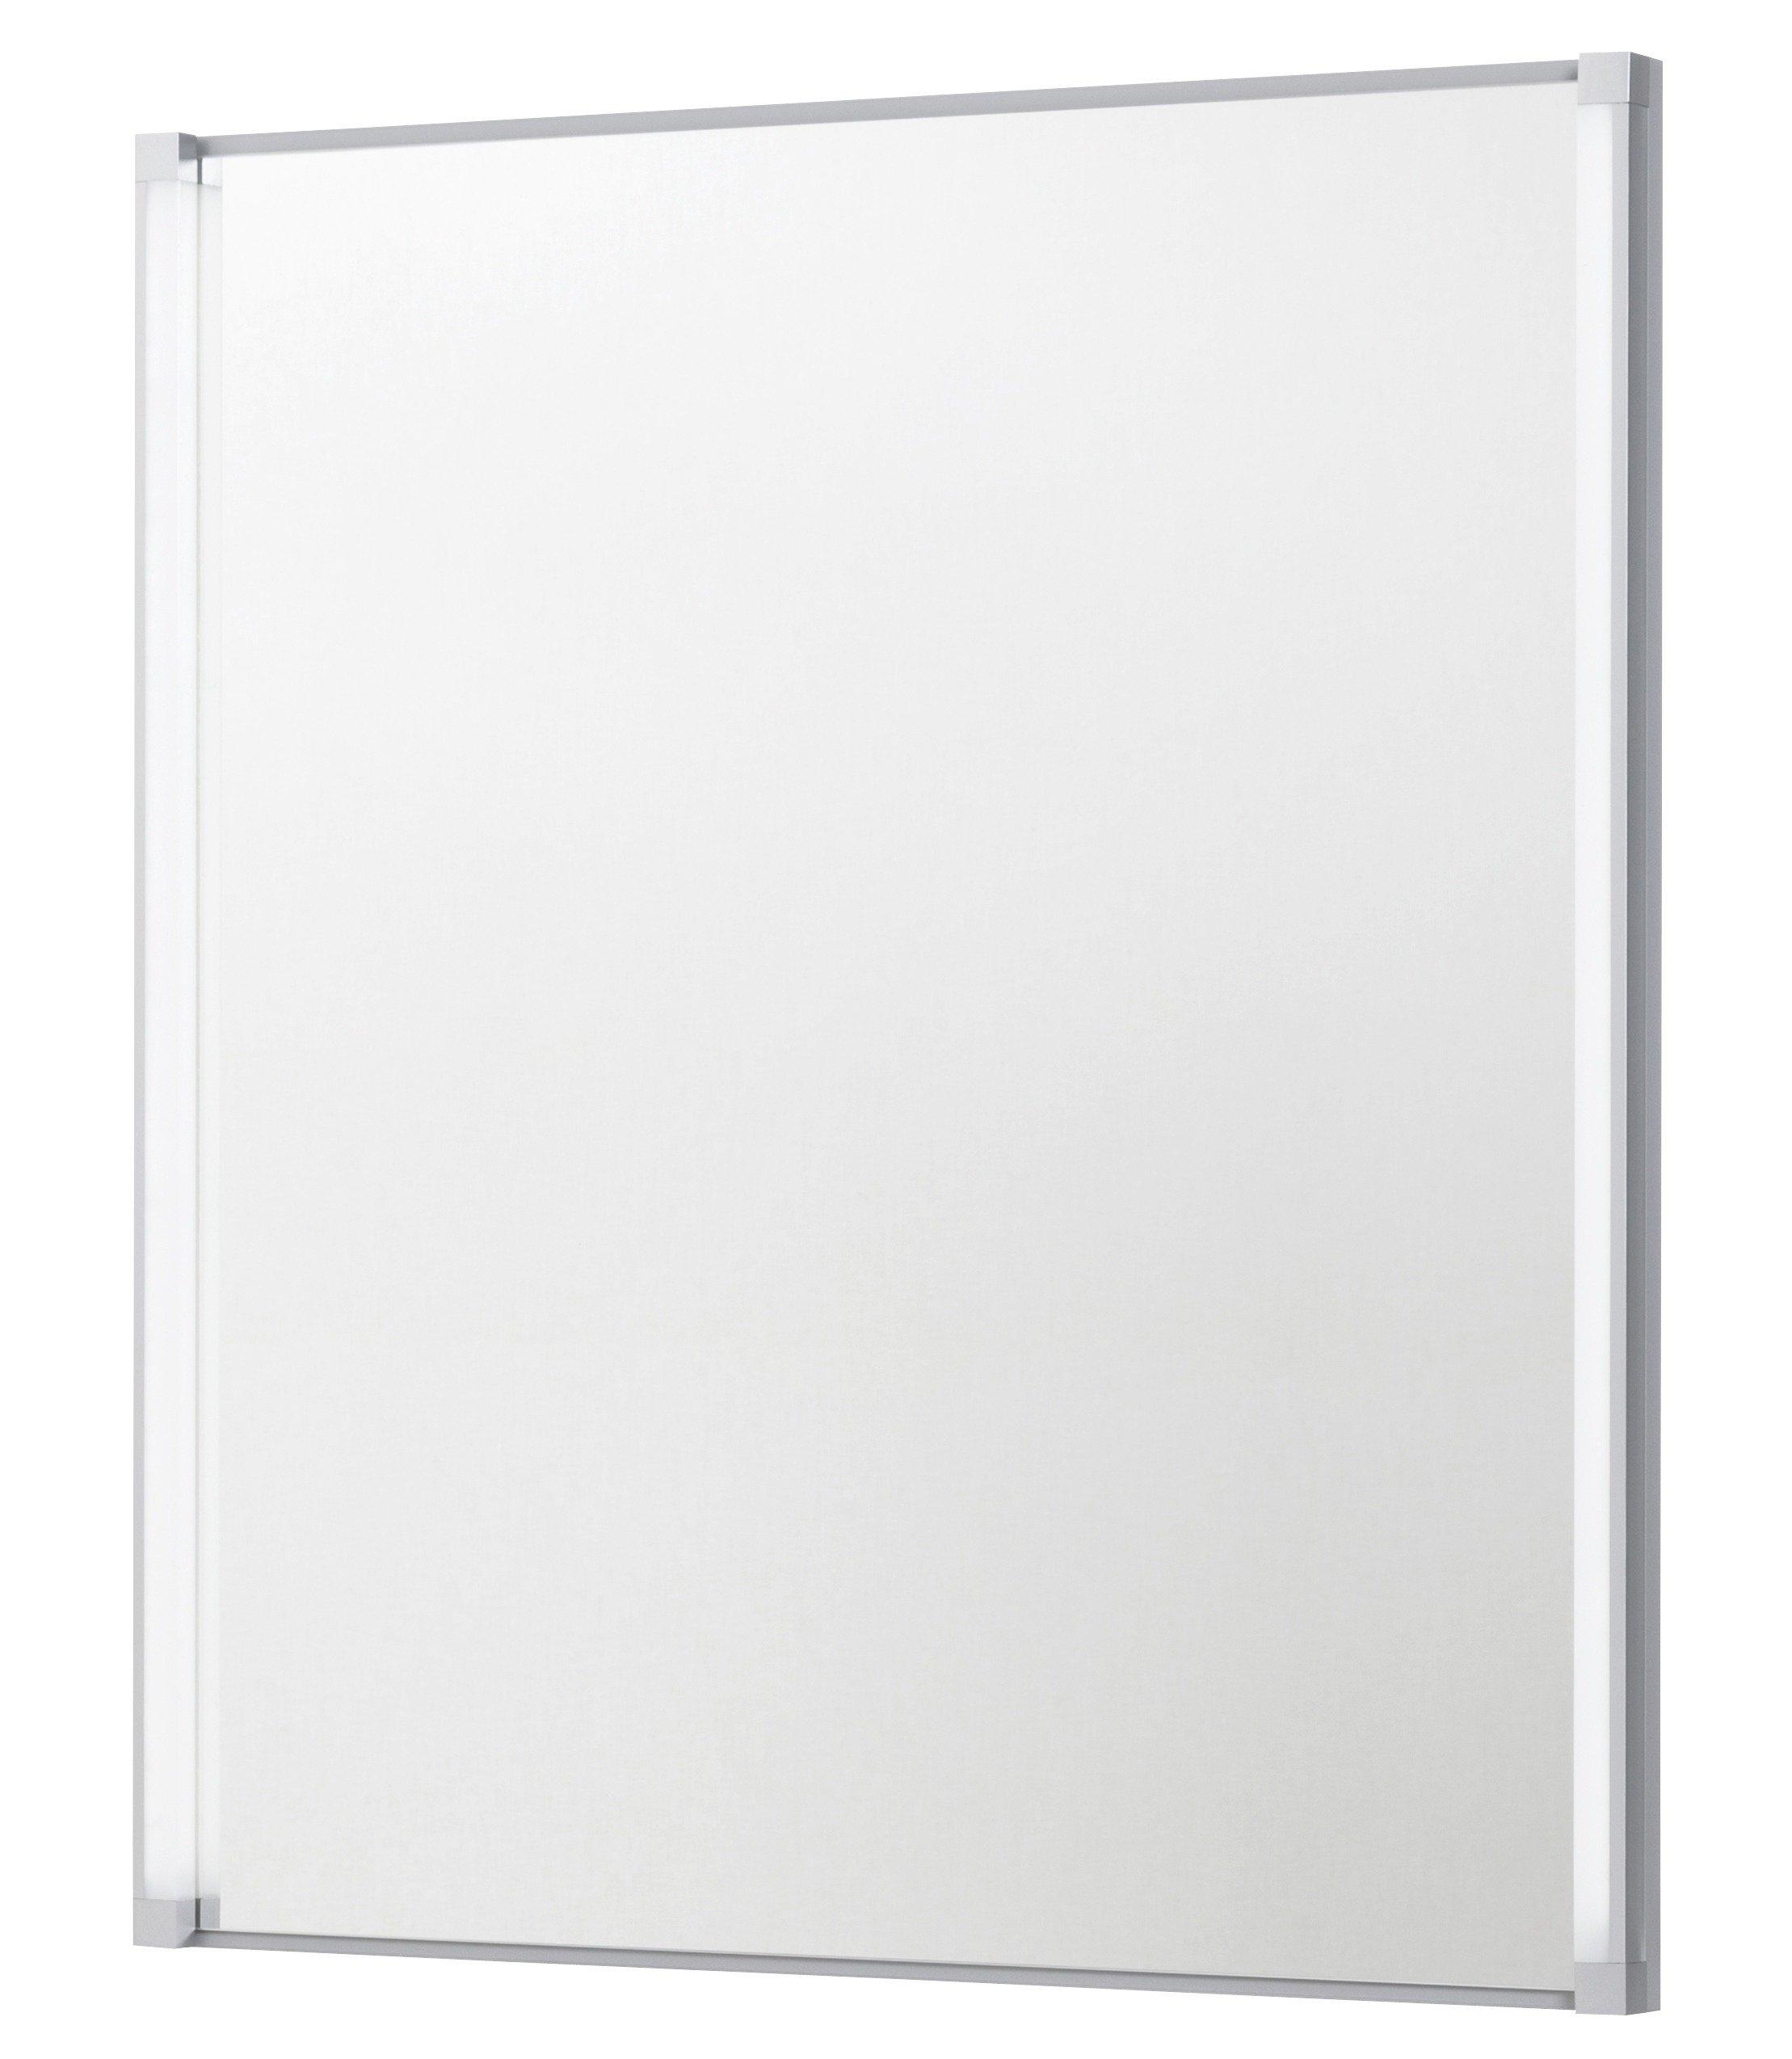 fackelmann spiegel led line breedte 60 5 cm makkelijk gekocht otto. Black Bedroom Furniture Sets. Home Design Ideas